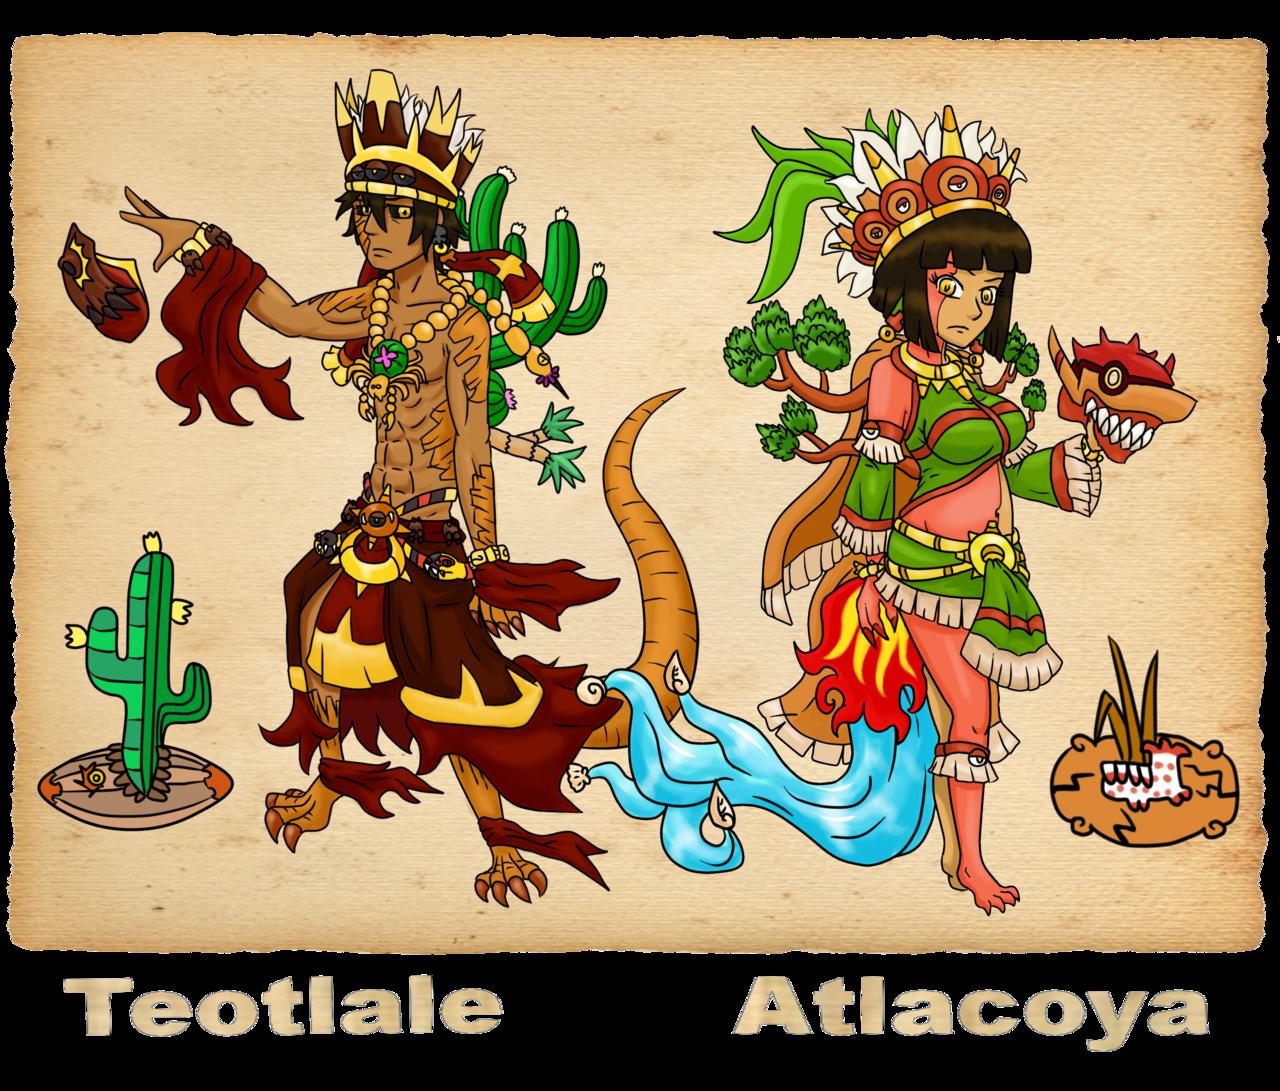 Mexican clipart senorita. Atlacoya y teotlale pinup